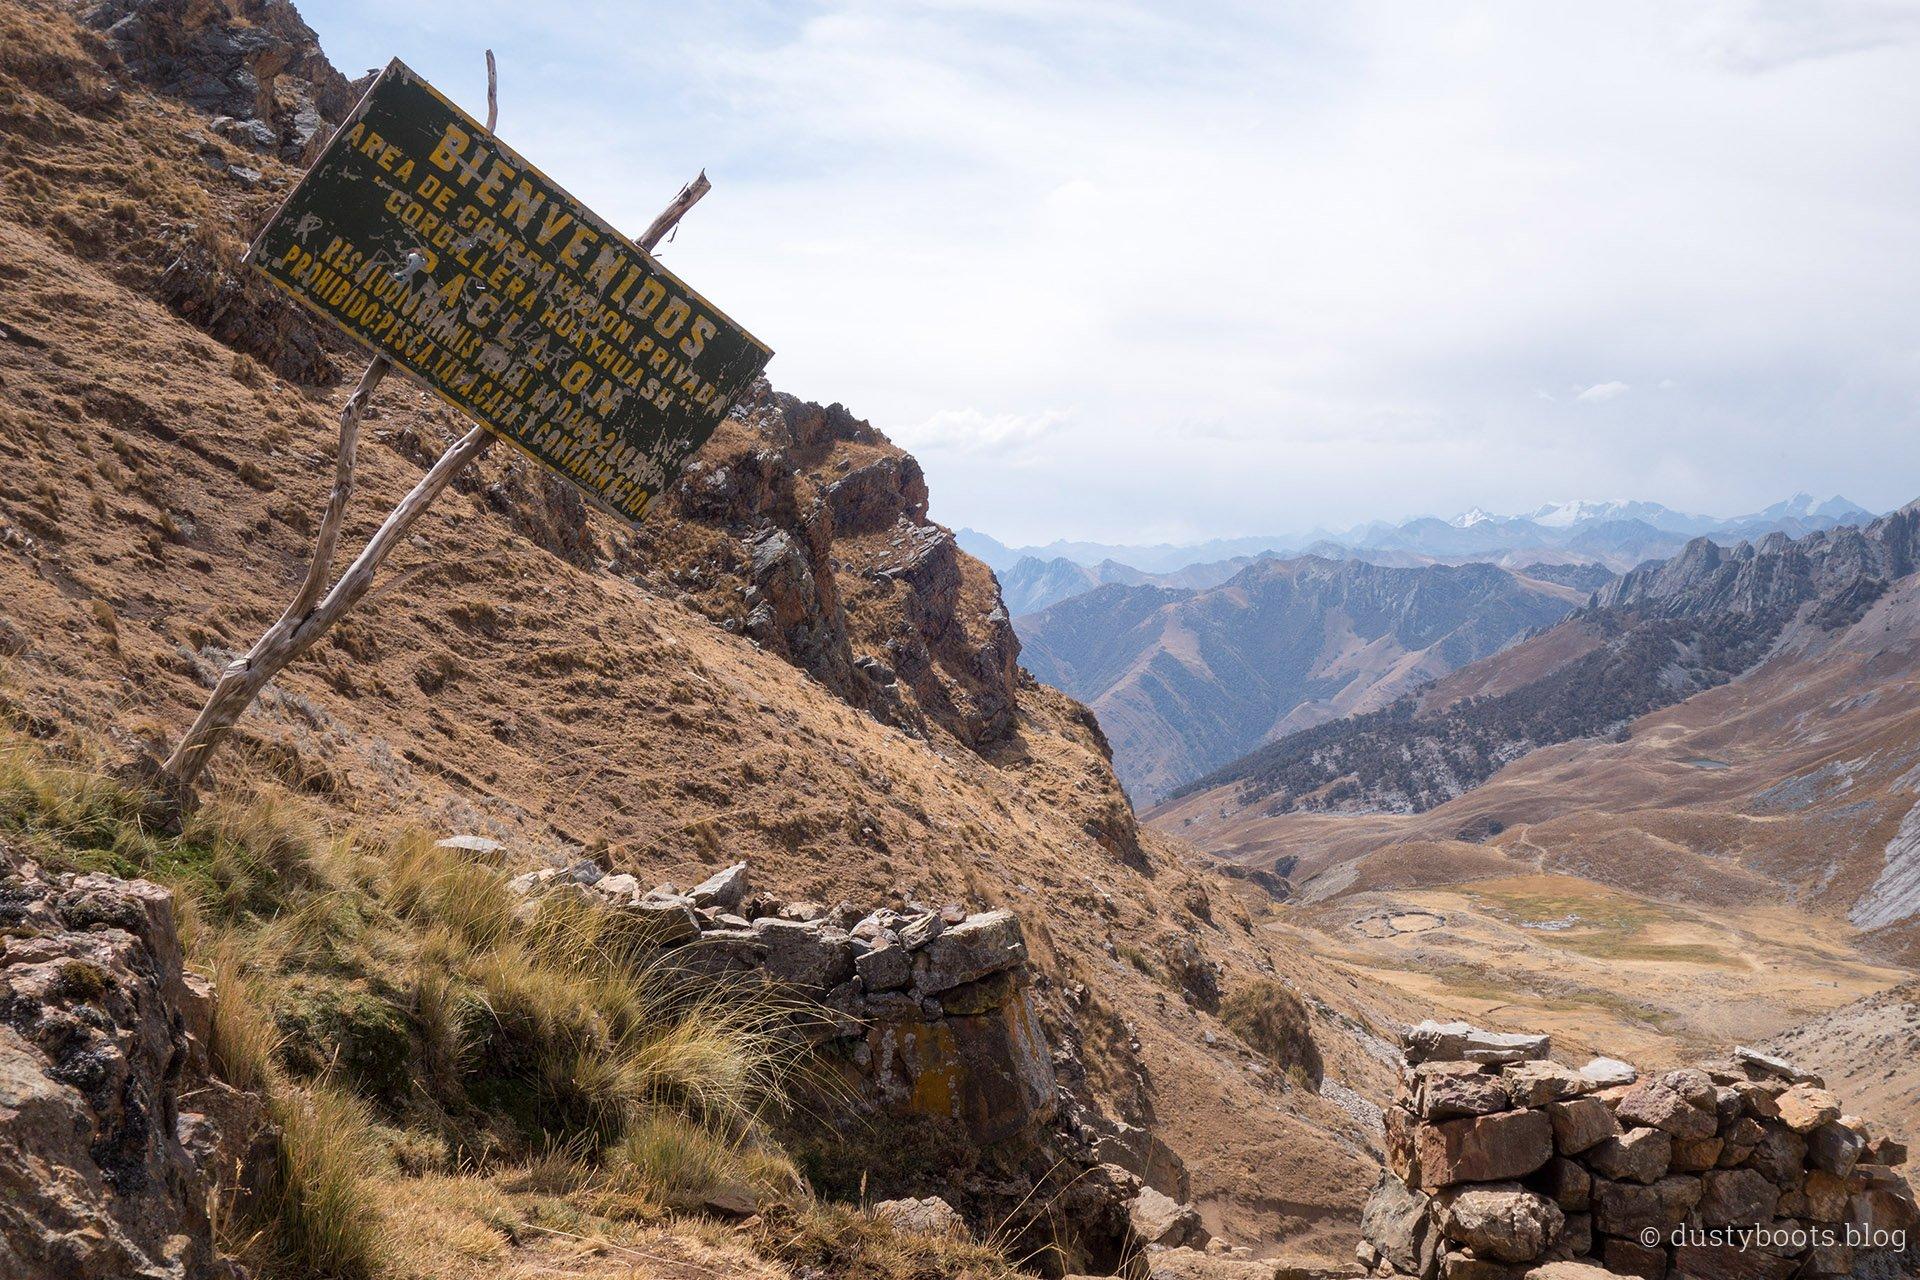 Tag 8: Abstieg vom Punta Tapush